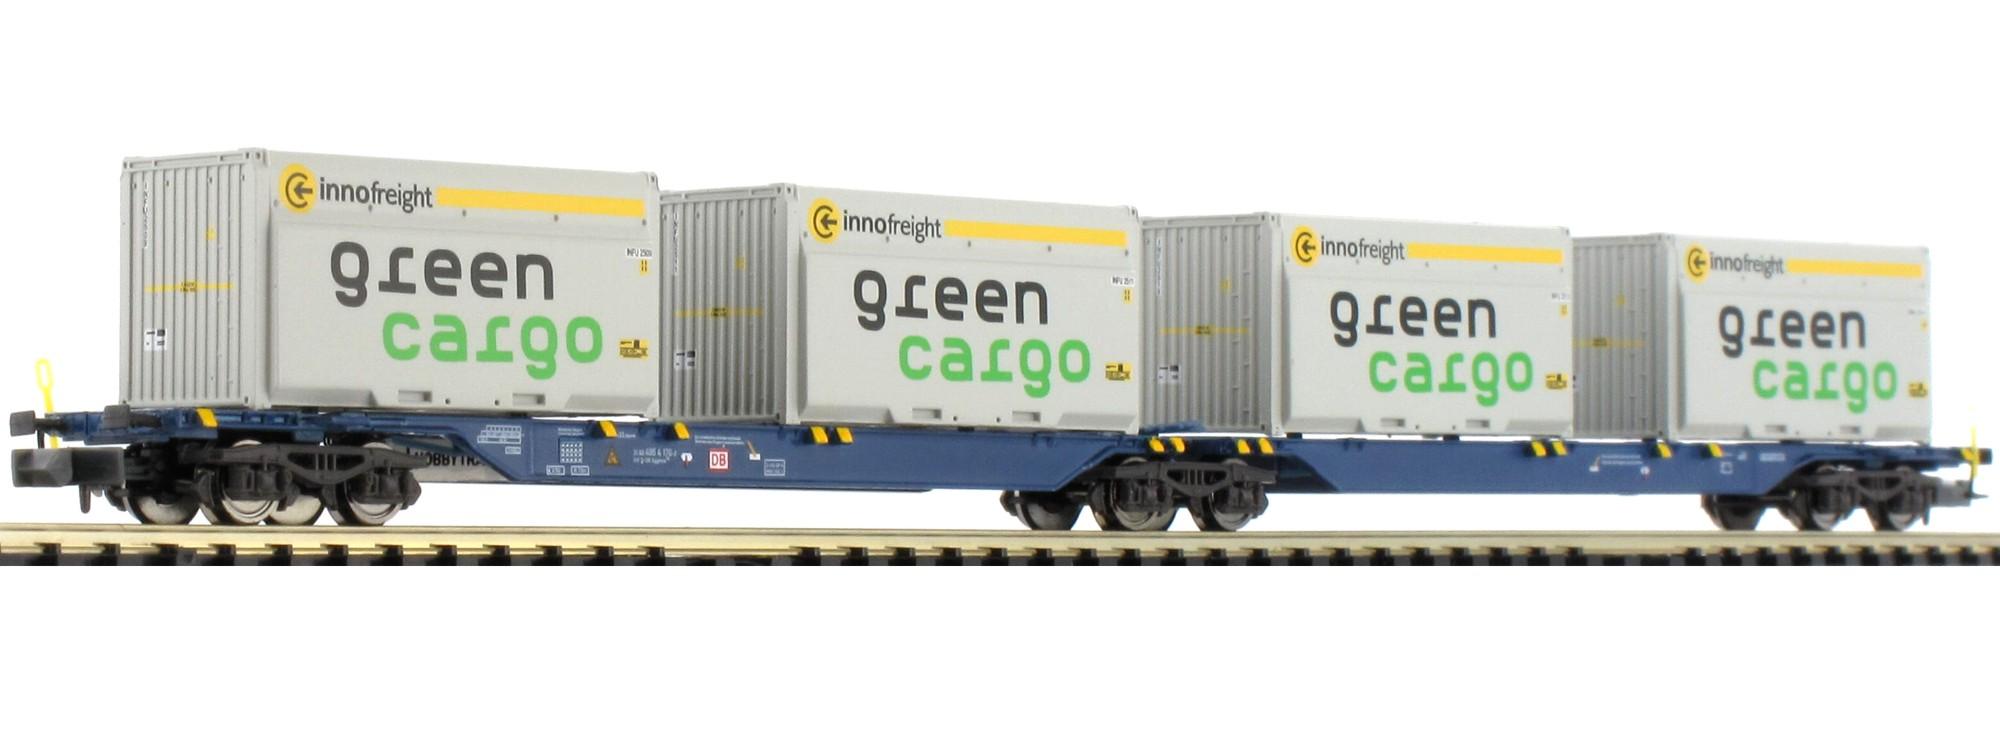 N Scale - Hobbytrain - H23718-4 - Flatcar, Sgkkms - Deutsche Bahn - 2-Pack